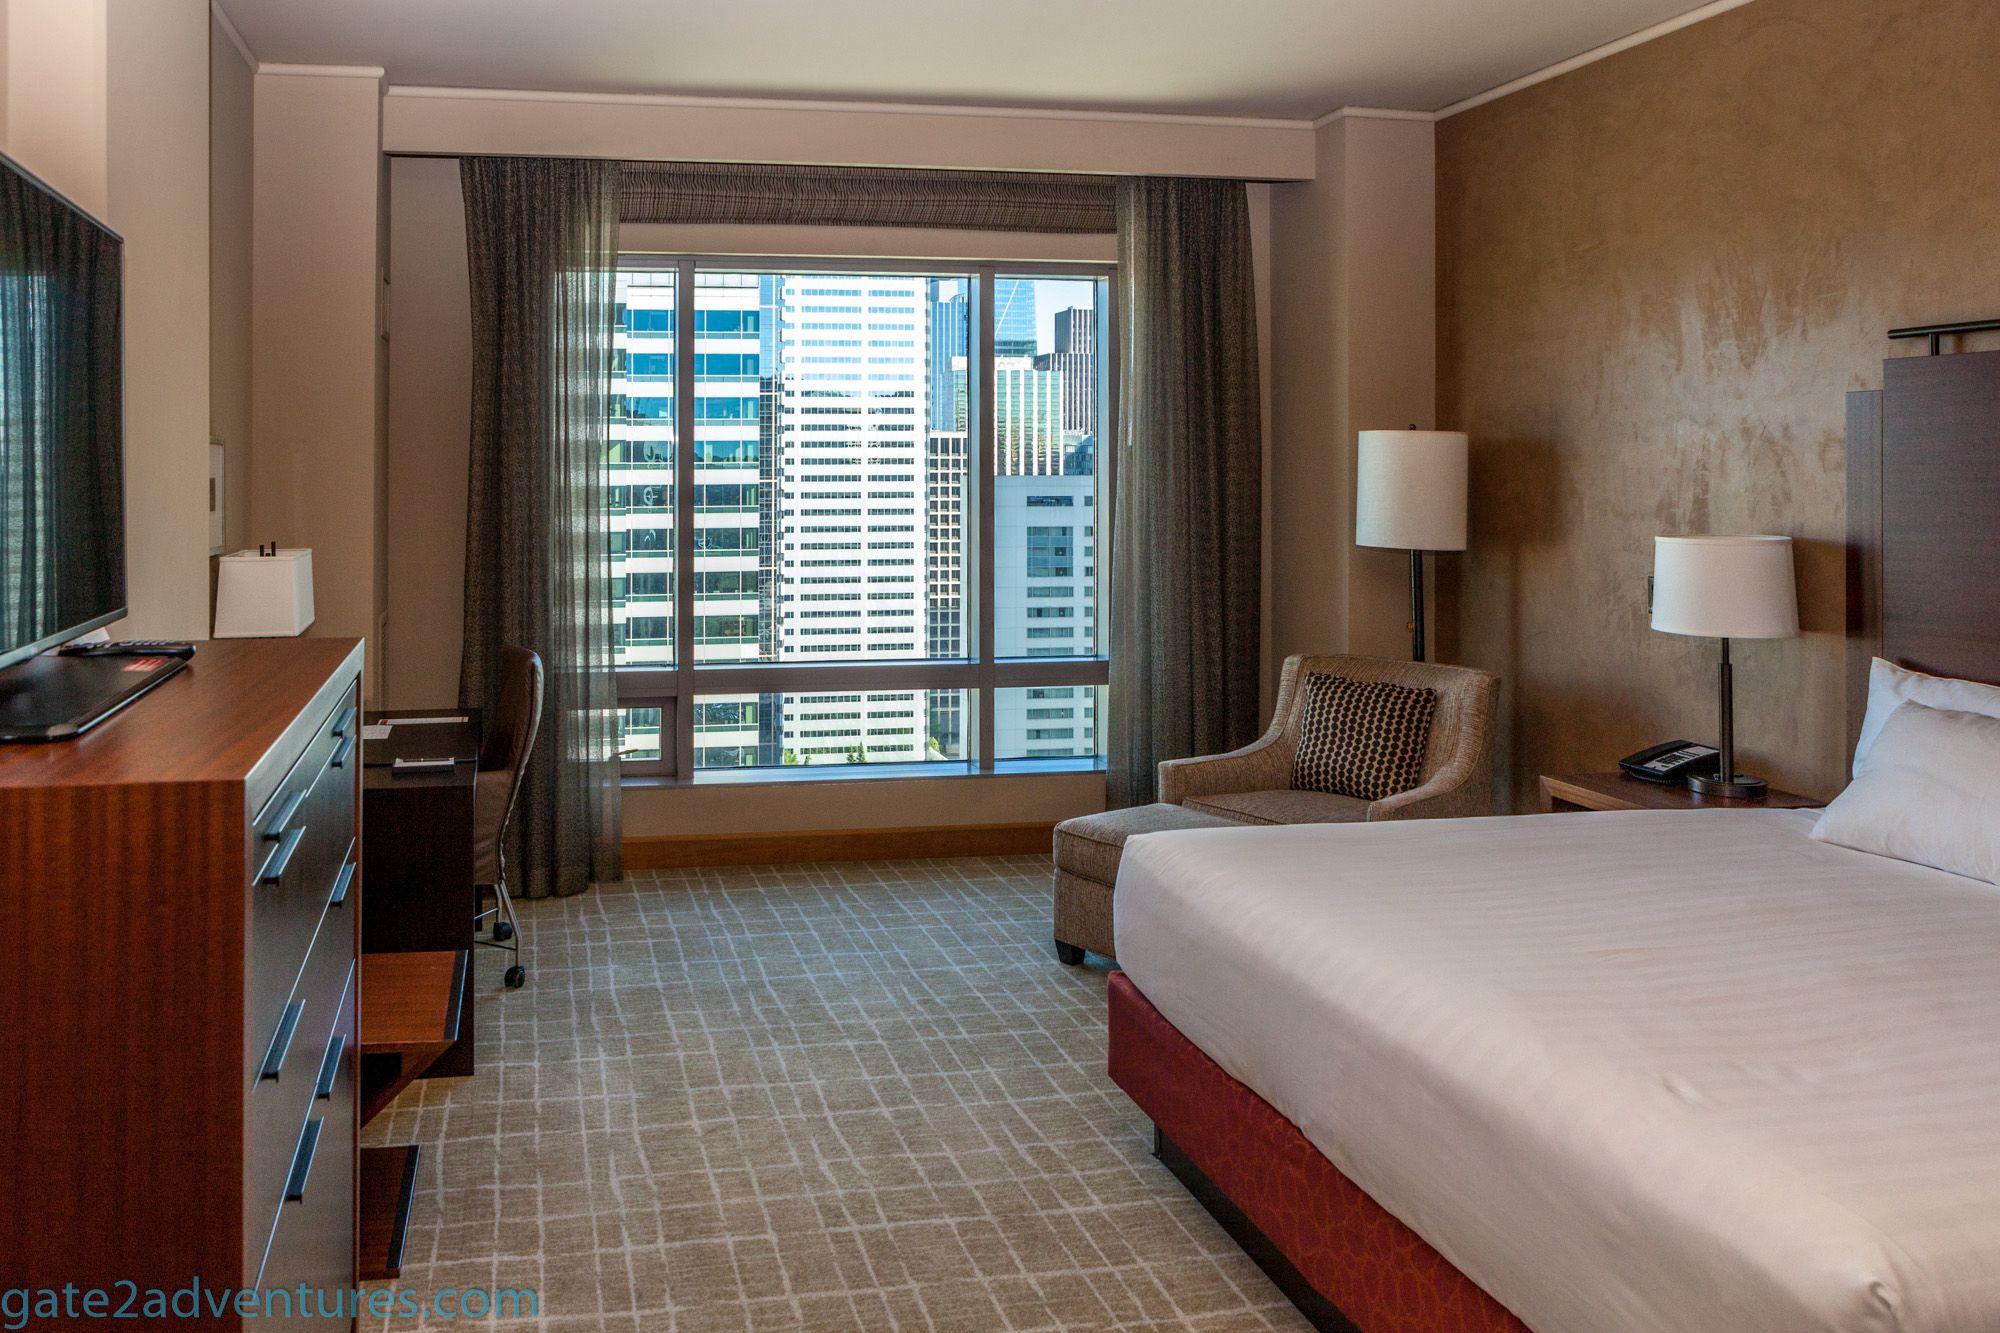 Hotel Review: Grand Hyatt Seattle